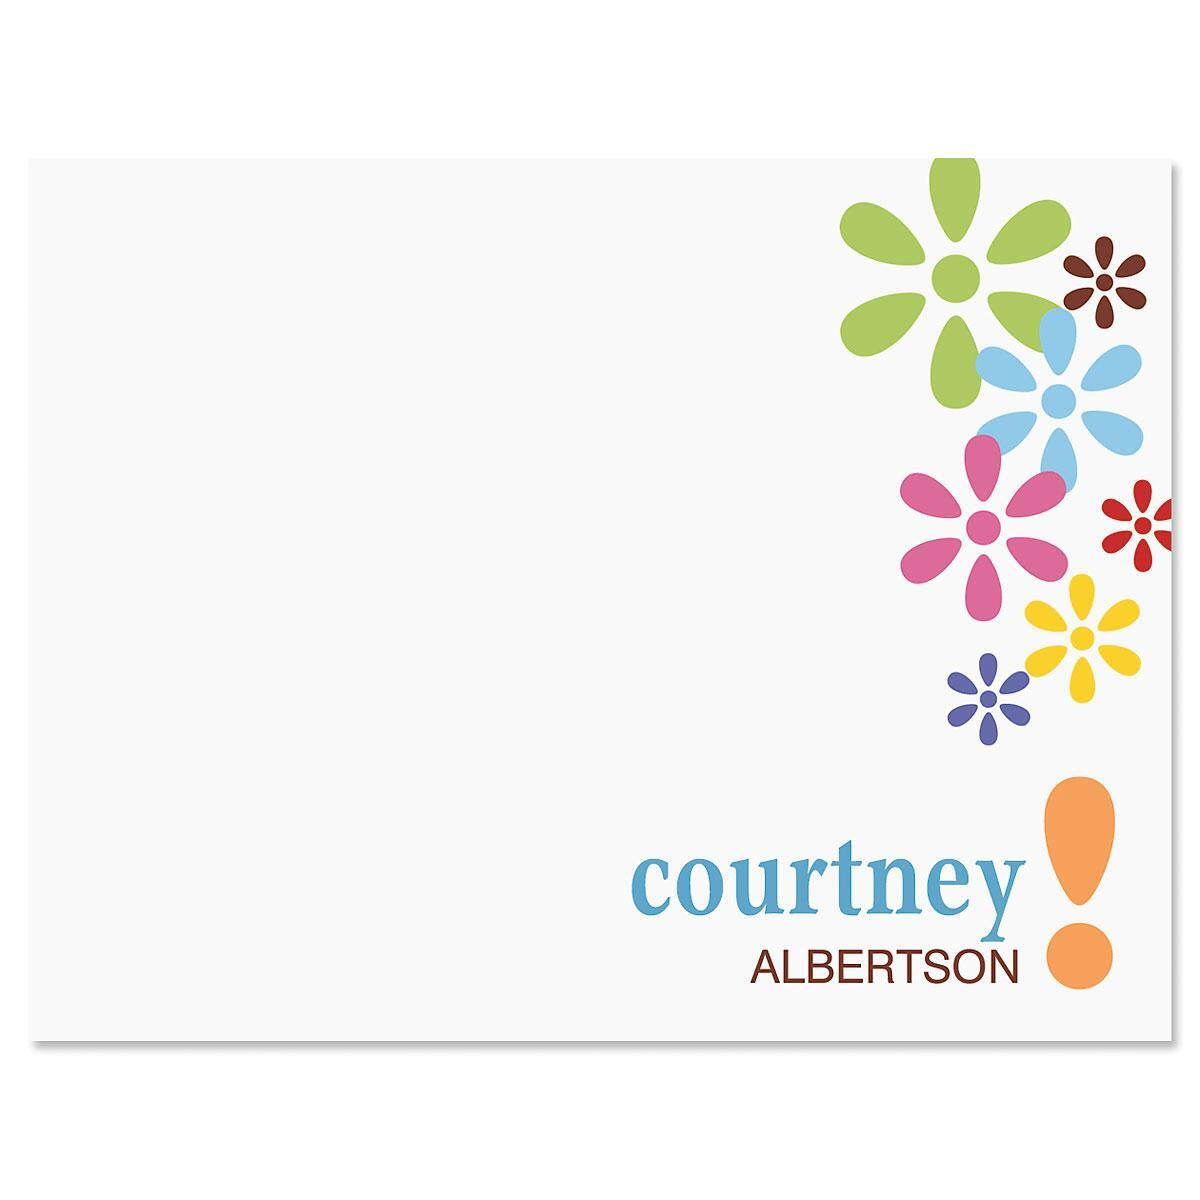 Hopscotch Personalized Correspondence Cards